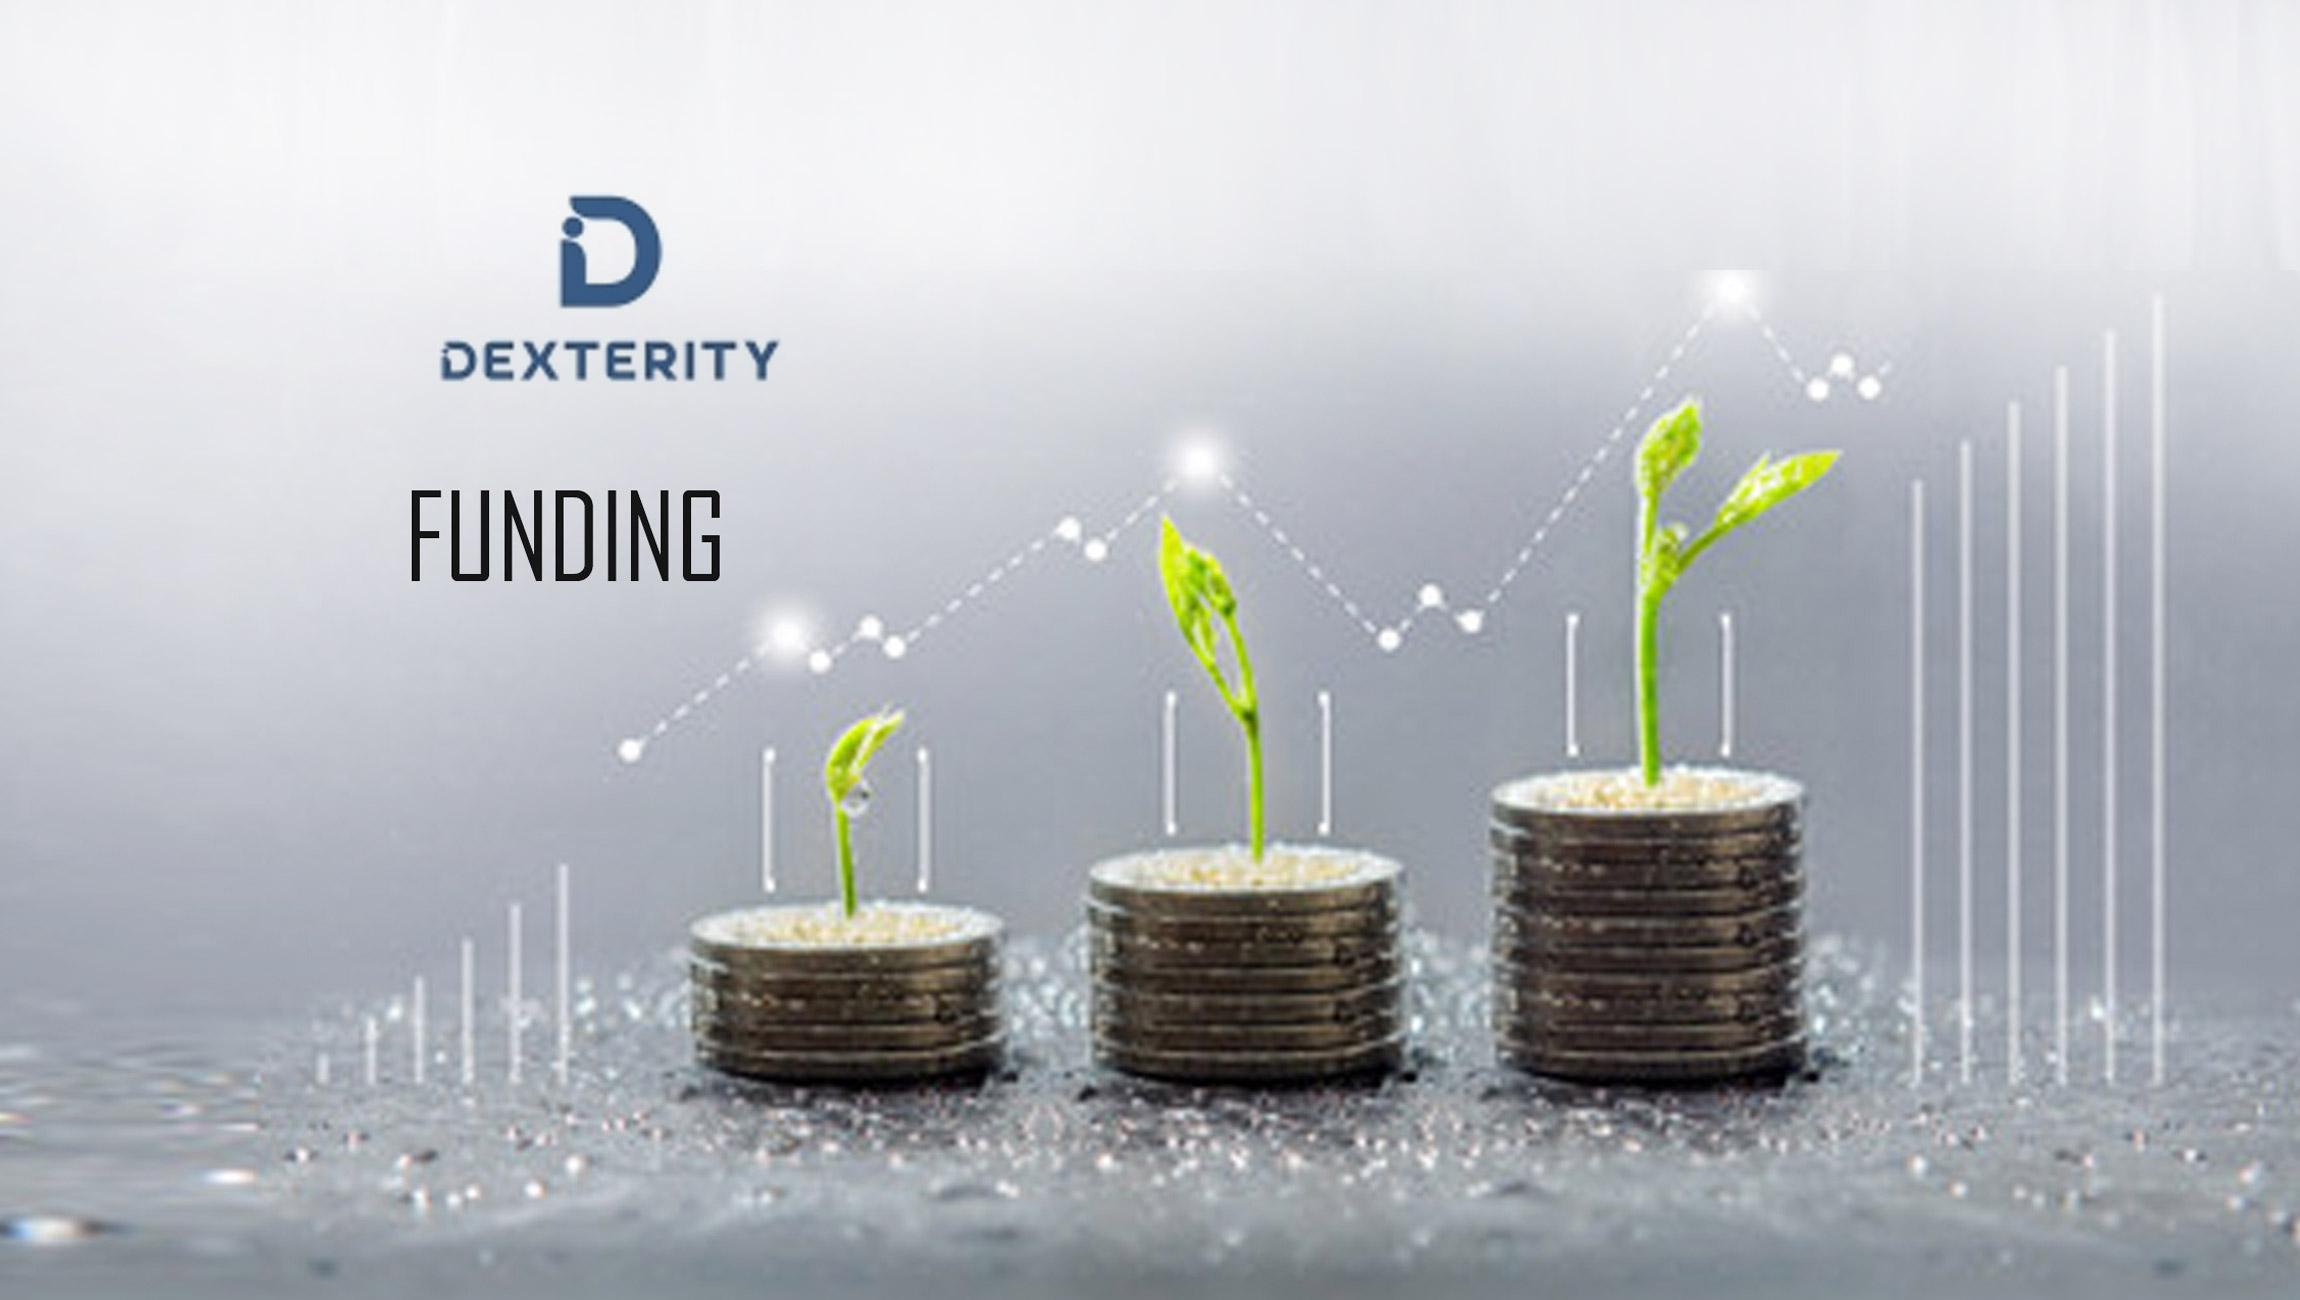 Dexterity Announces US$140M in New Funding